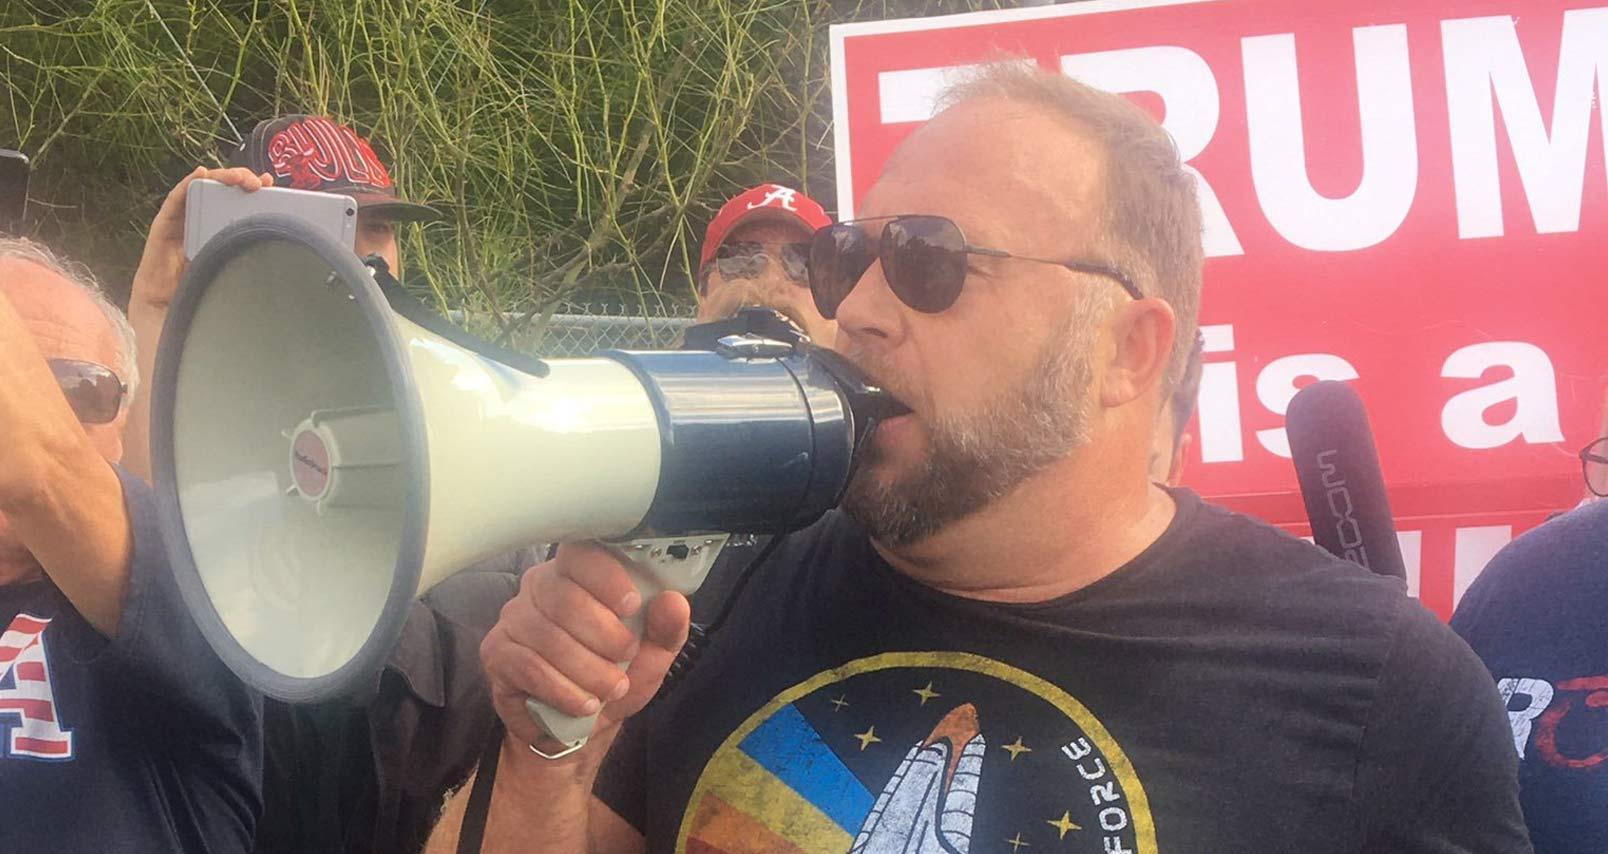 WarRoom: Alex Jones Bullhorns Trump & Antifa in Austin, Texas